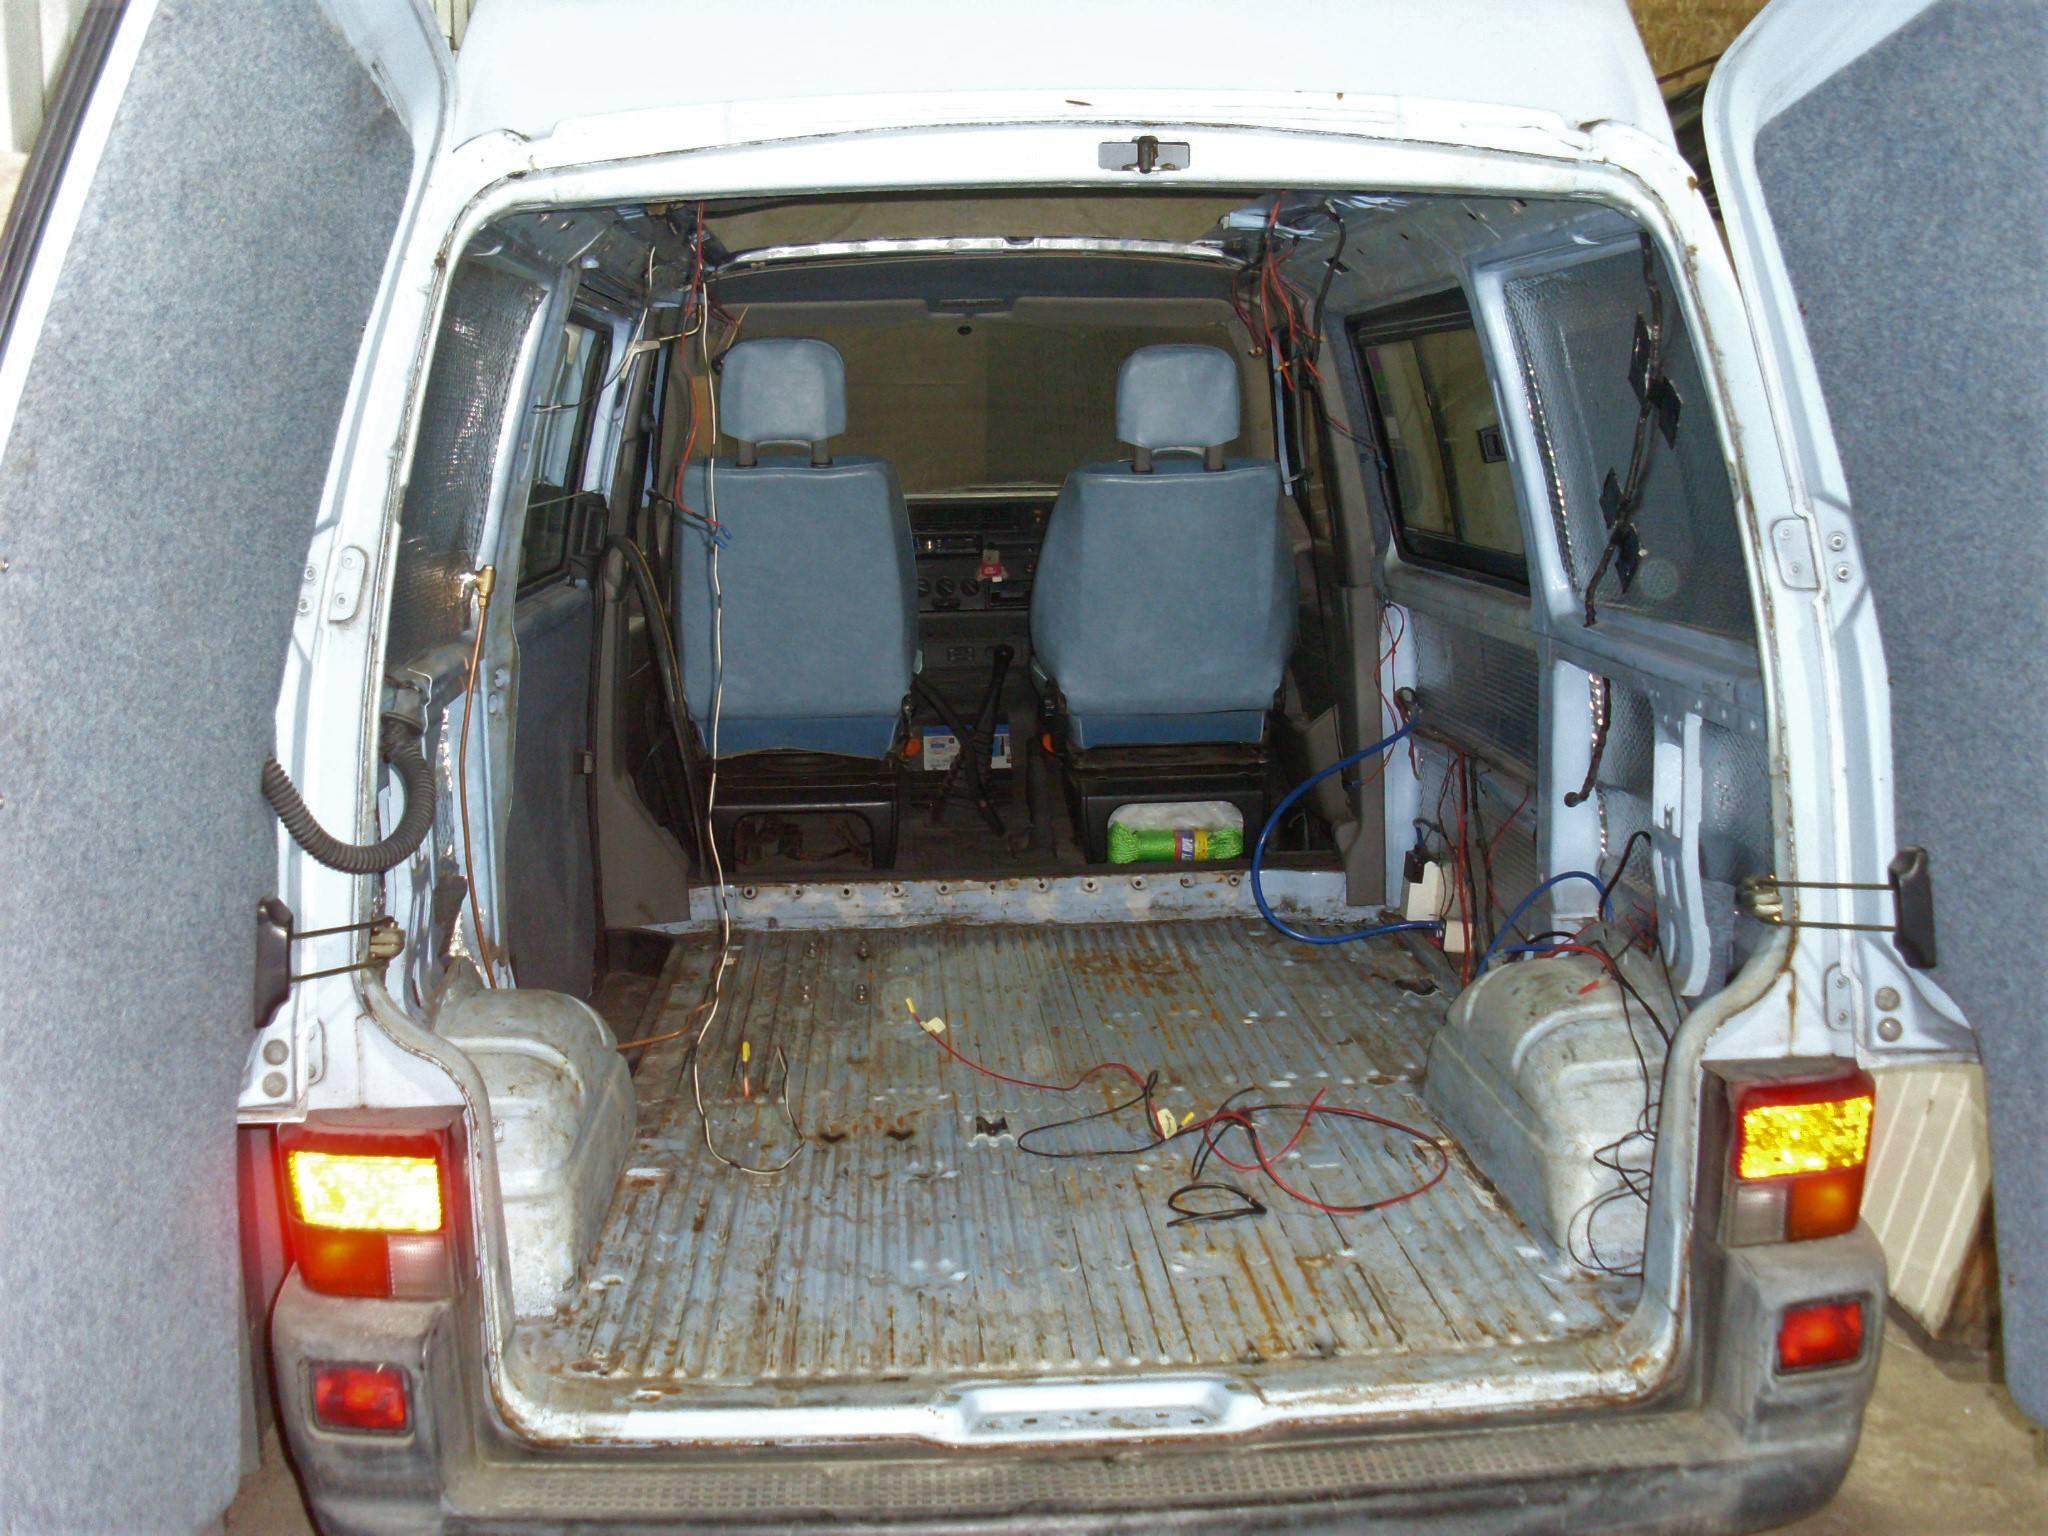 VW T4 refurb, strip out inside.